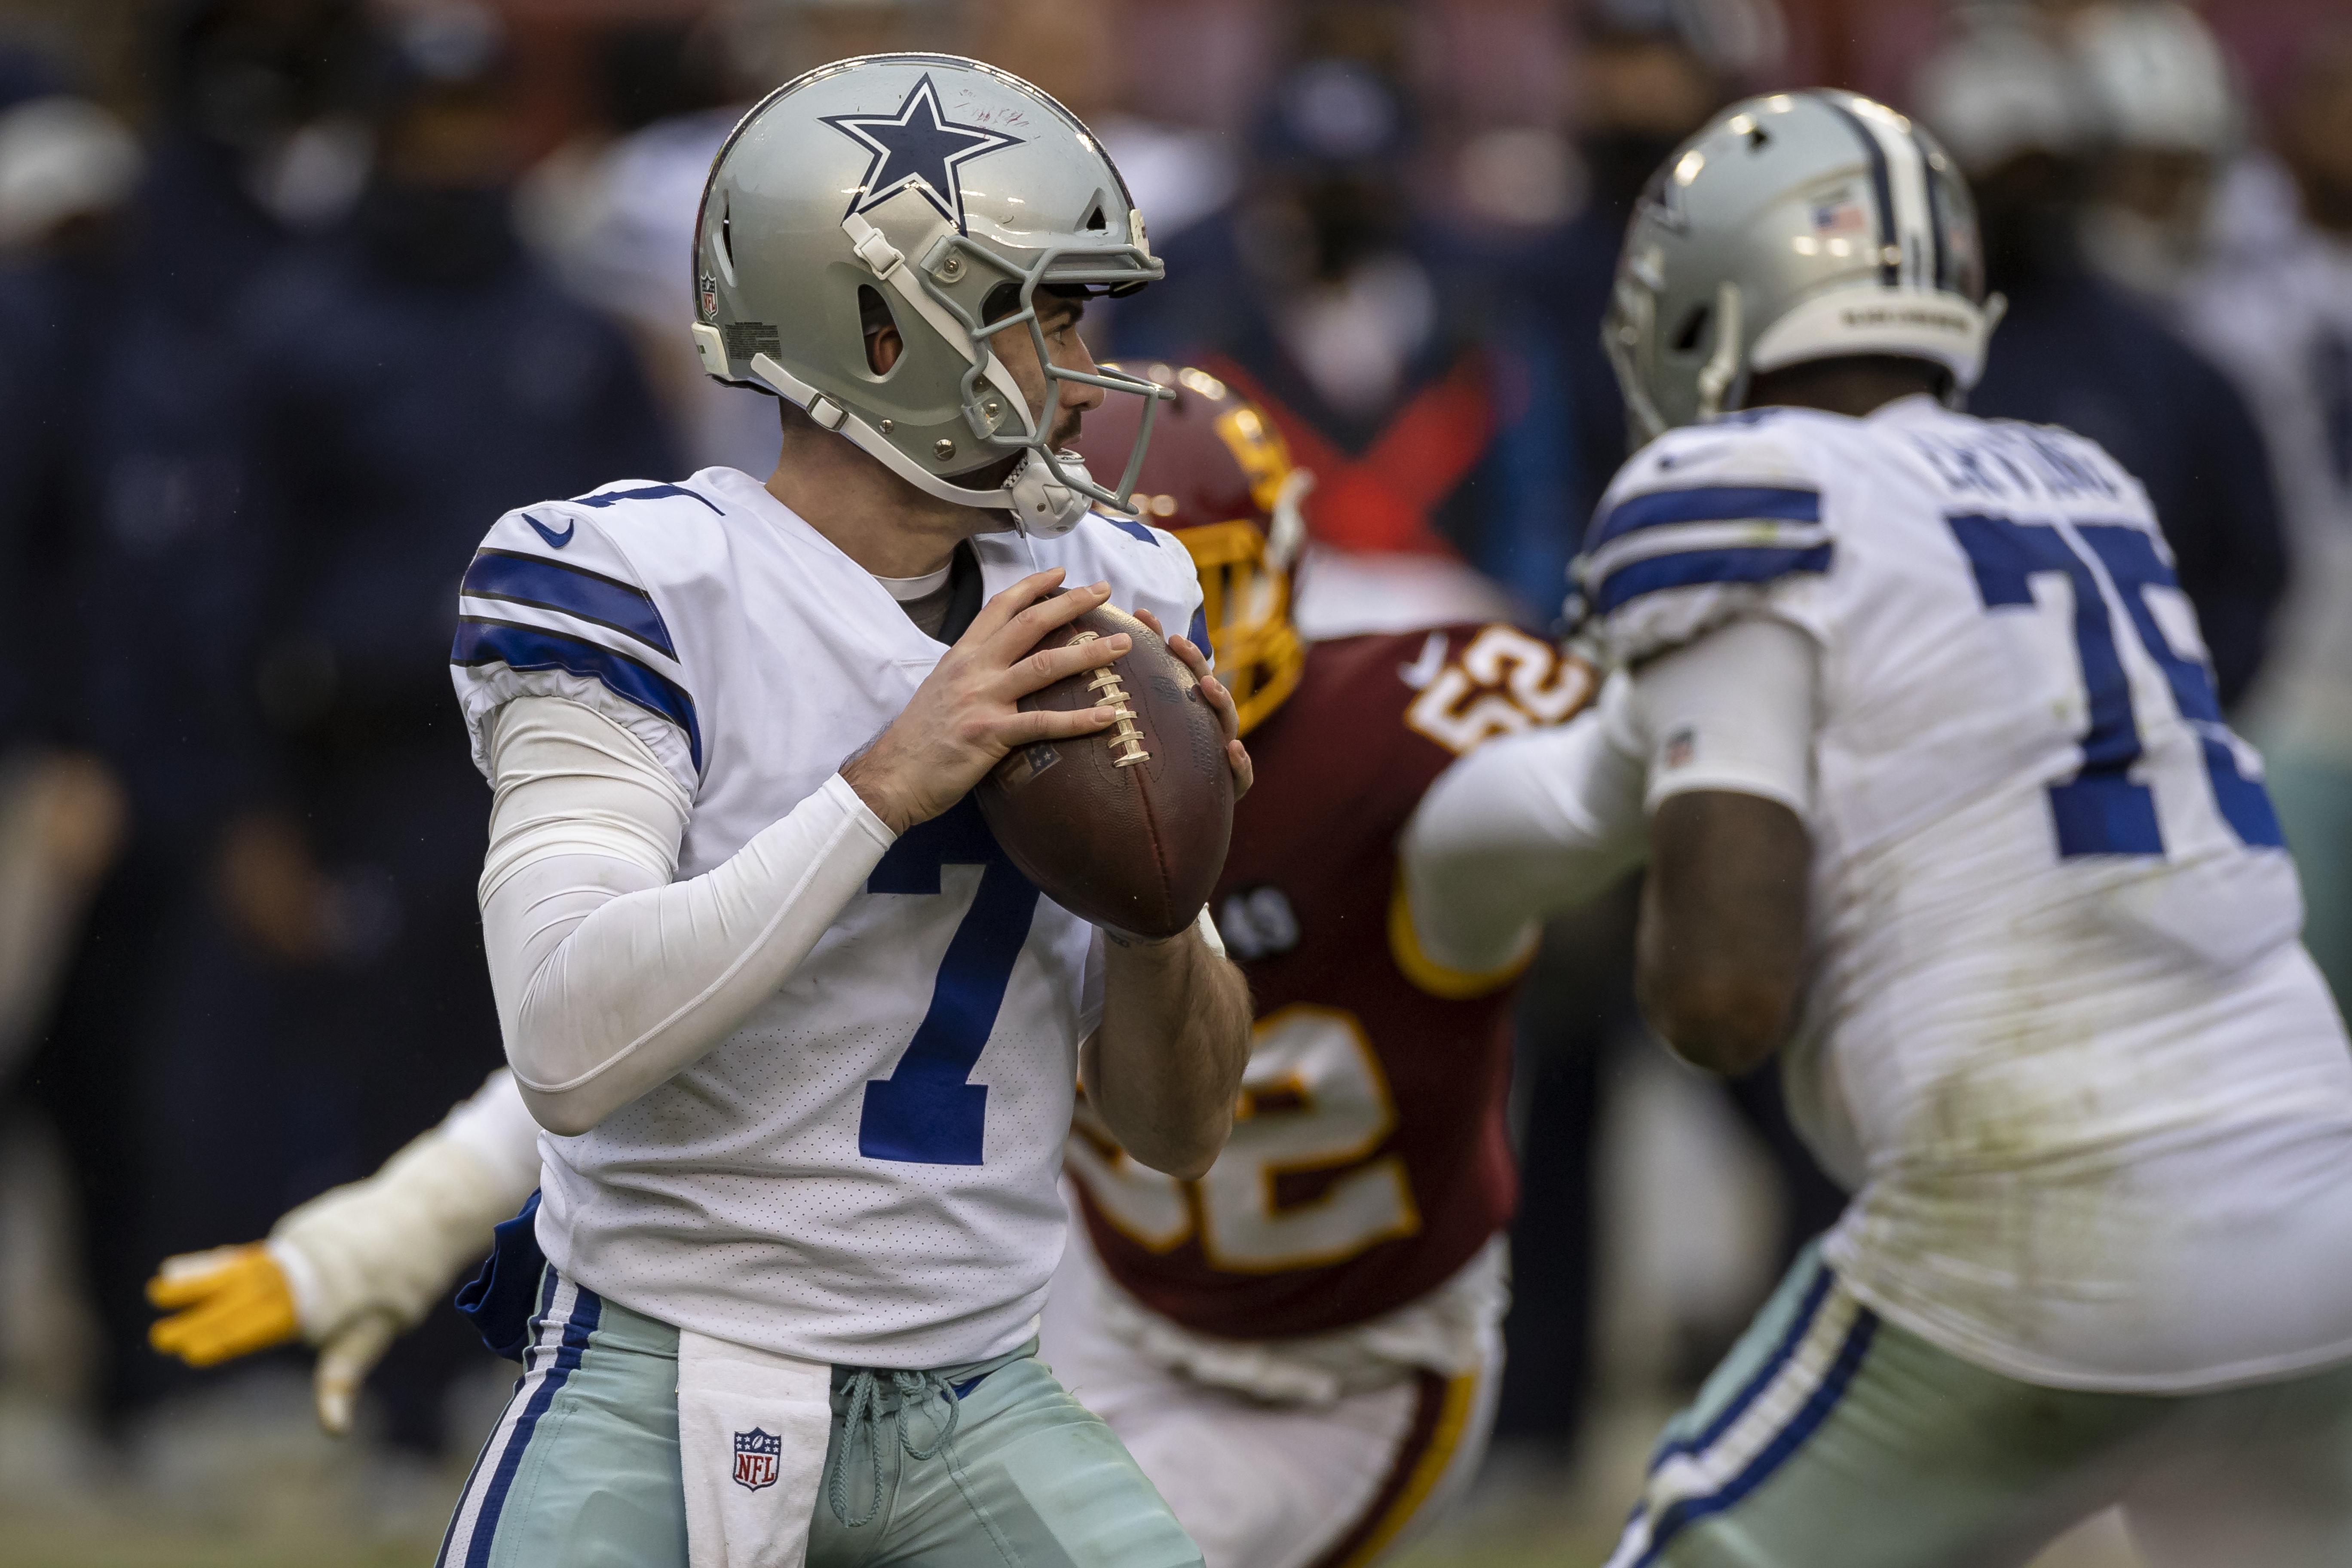 NFL Fans Dig Up Cowboys QB Ben DiNucci's Old Disturbing Tweets During His First NFL Start Vs Eagles